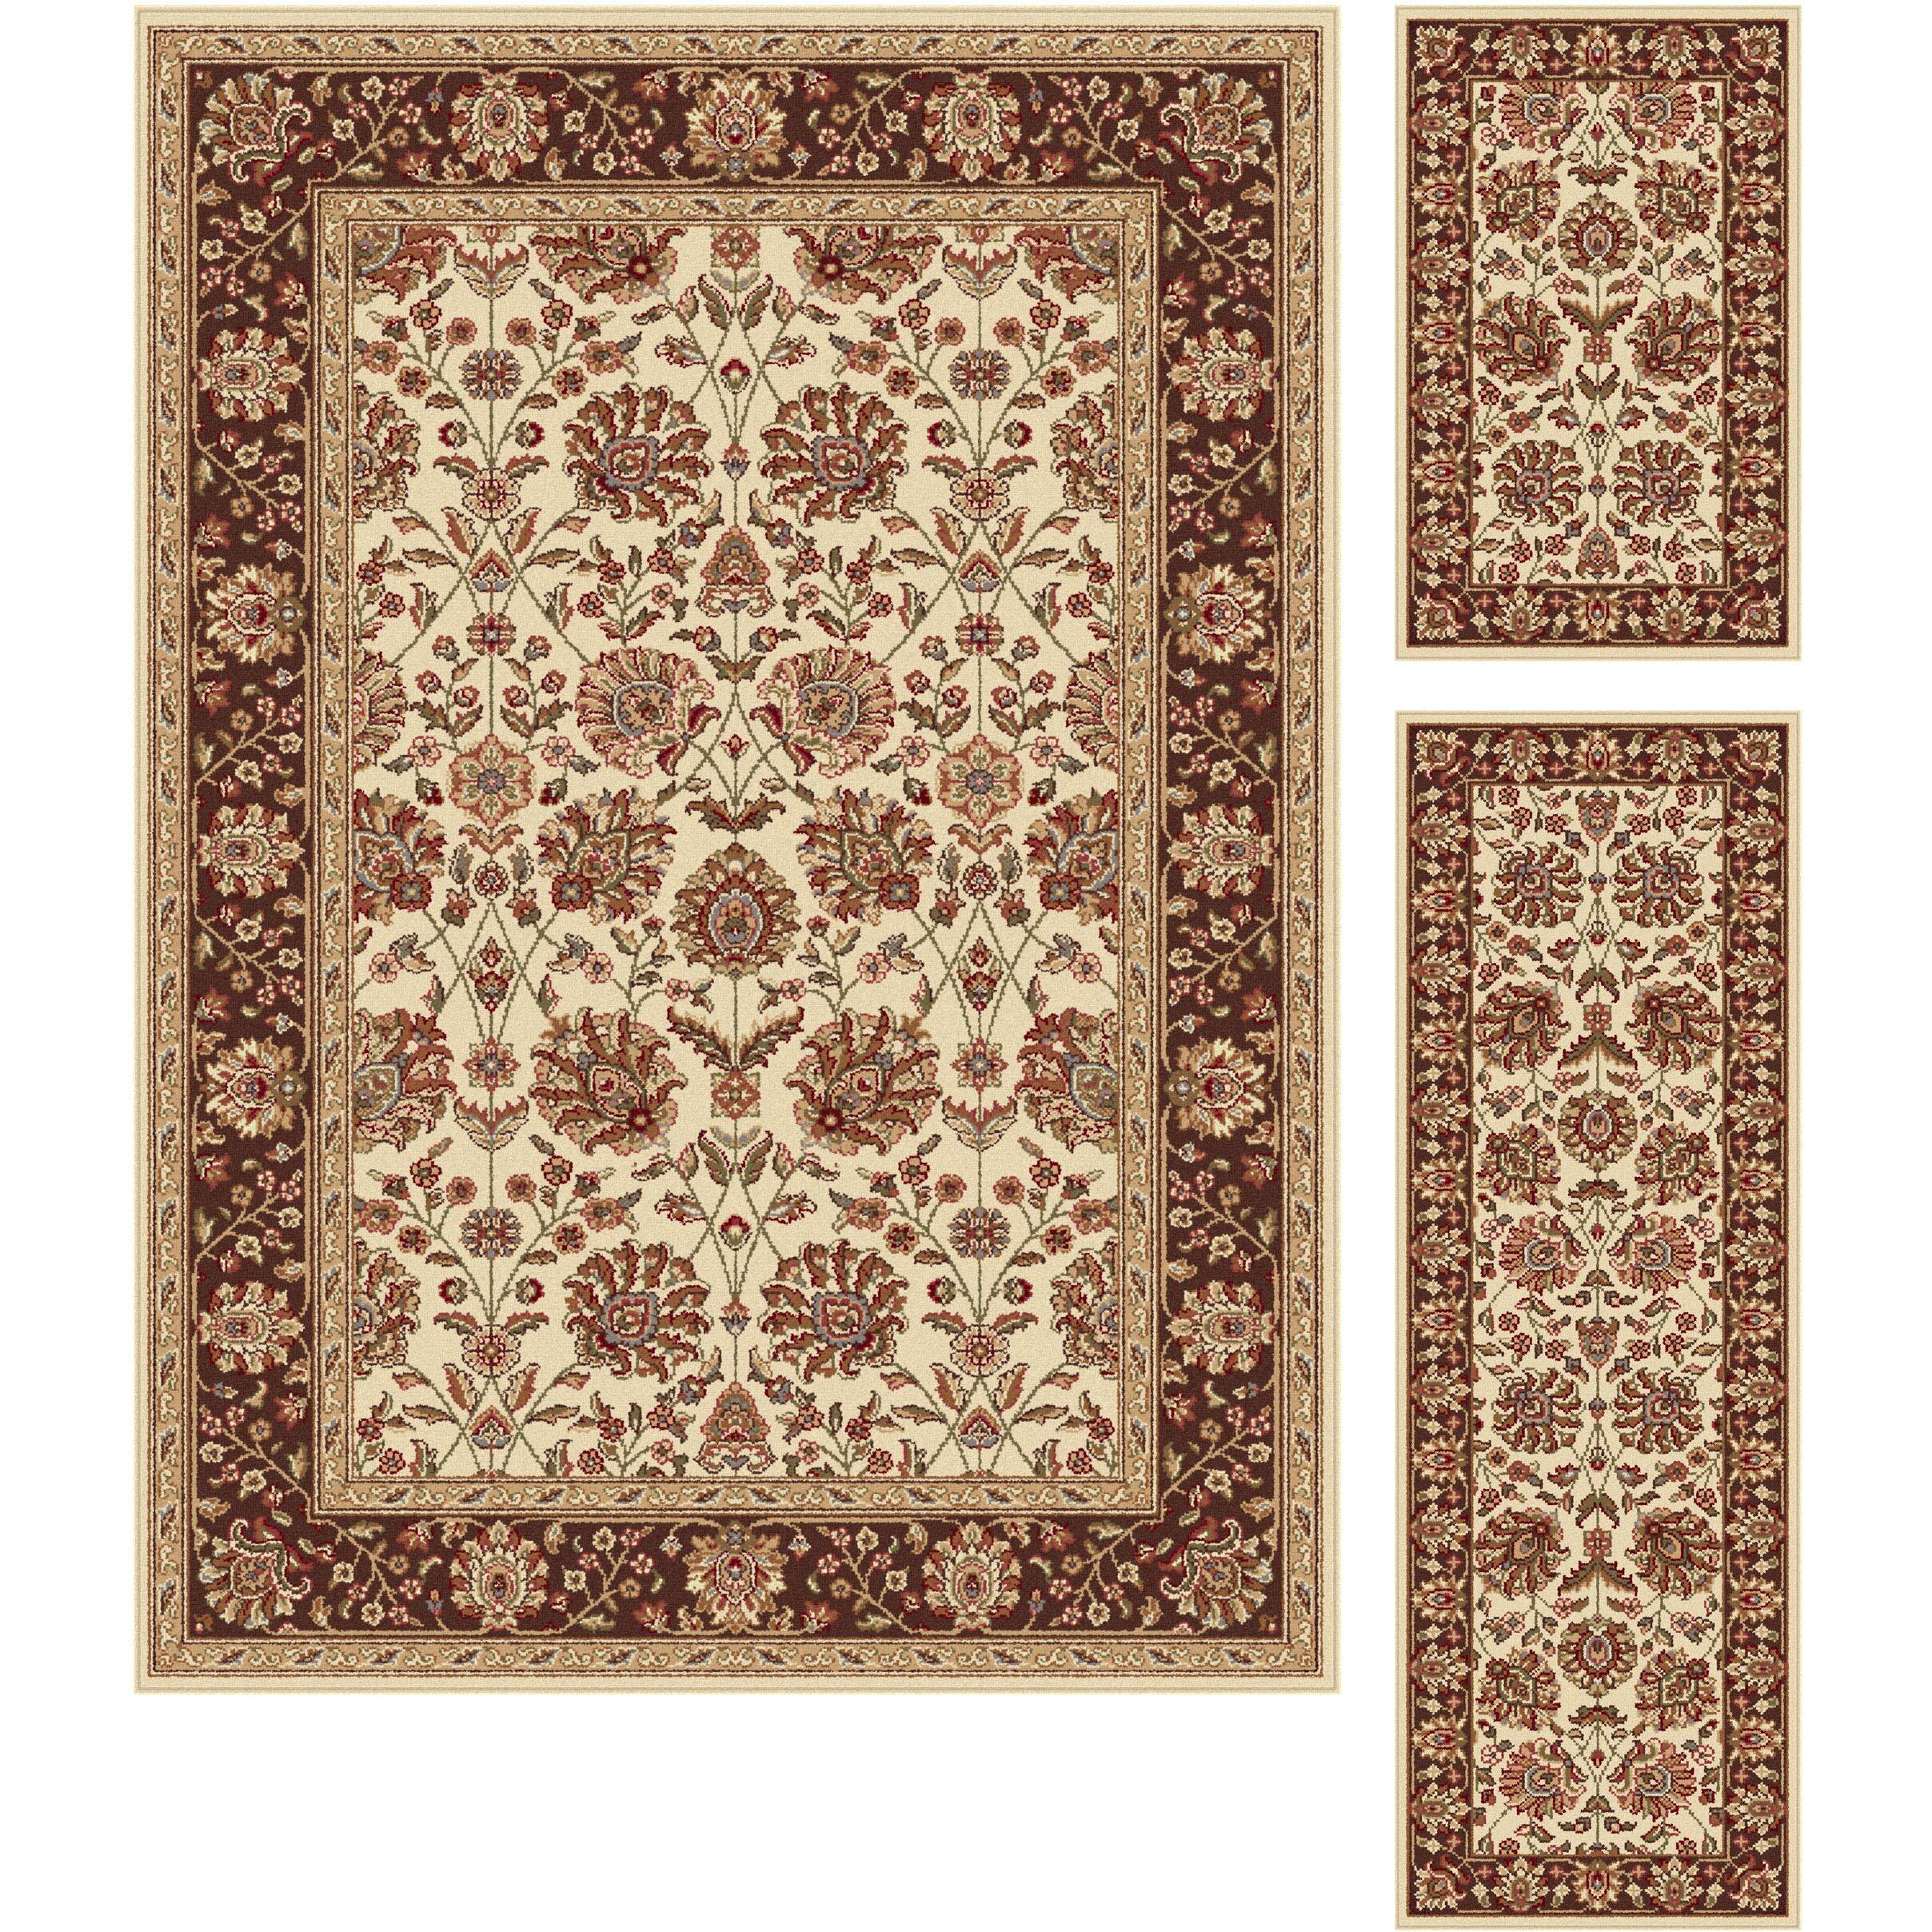 Threadbind litchford 3 piece beige area rug set reviews for Area rug sets